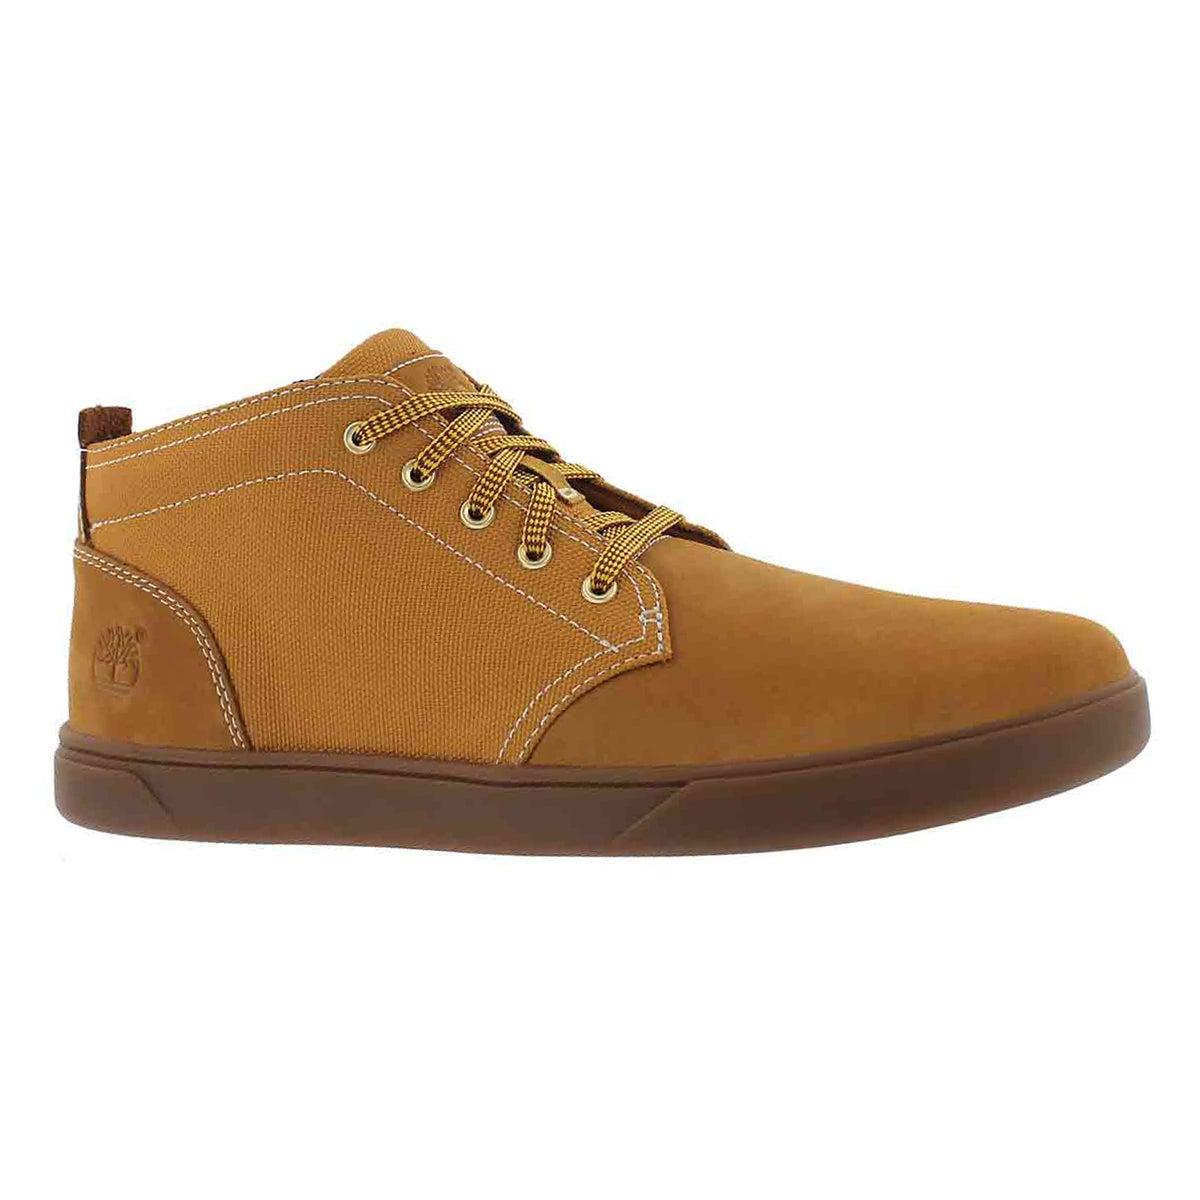 Mns Groveton wheat chukka boot